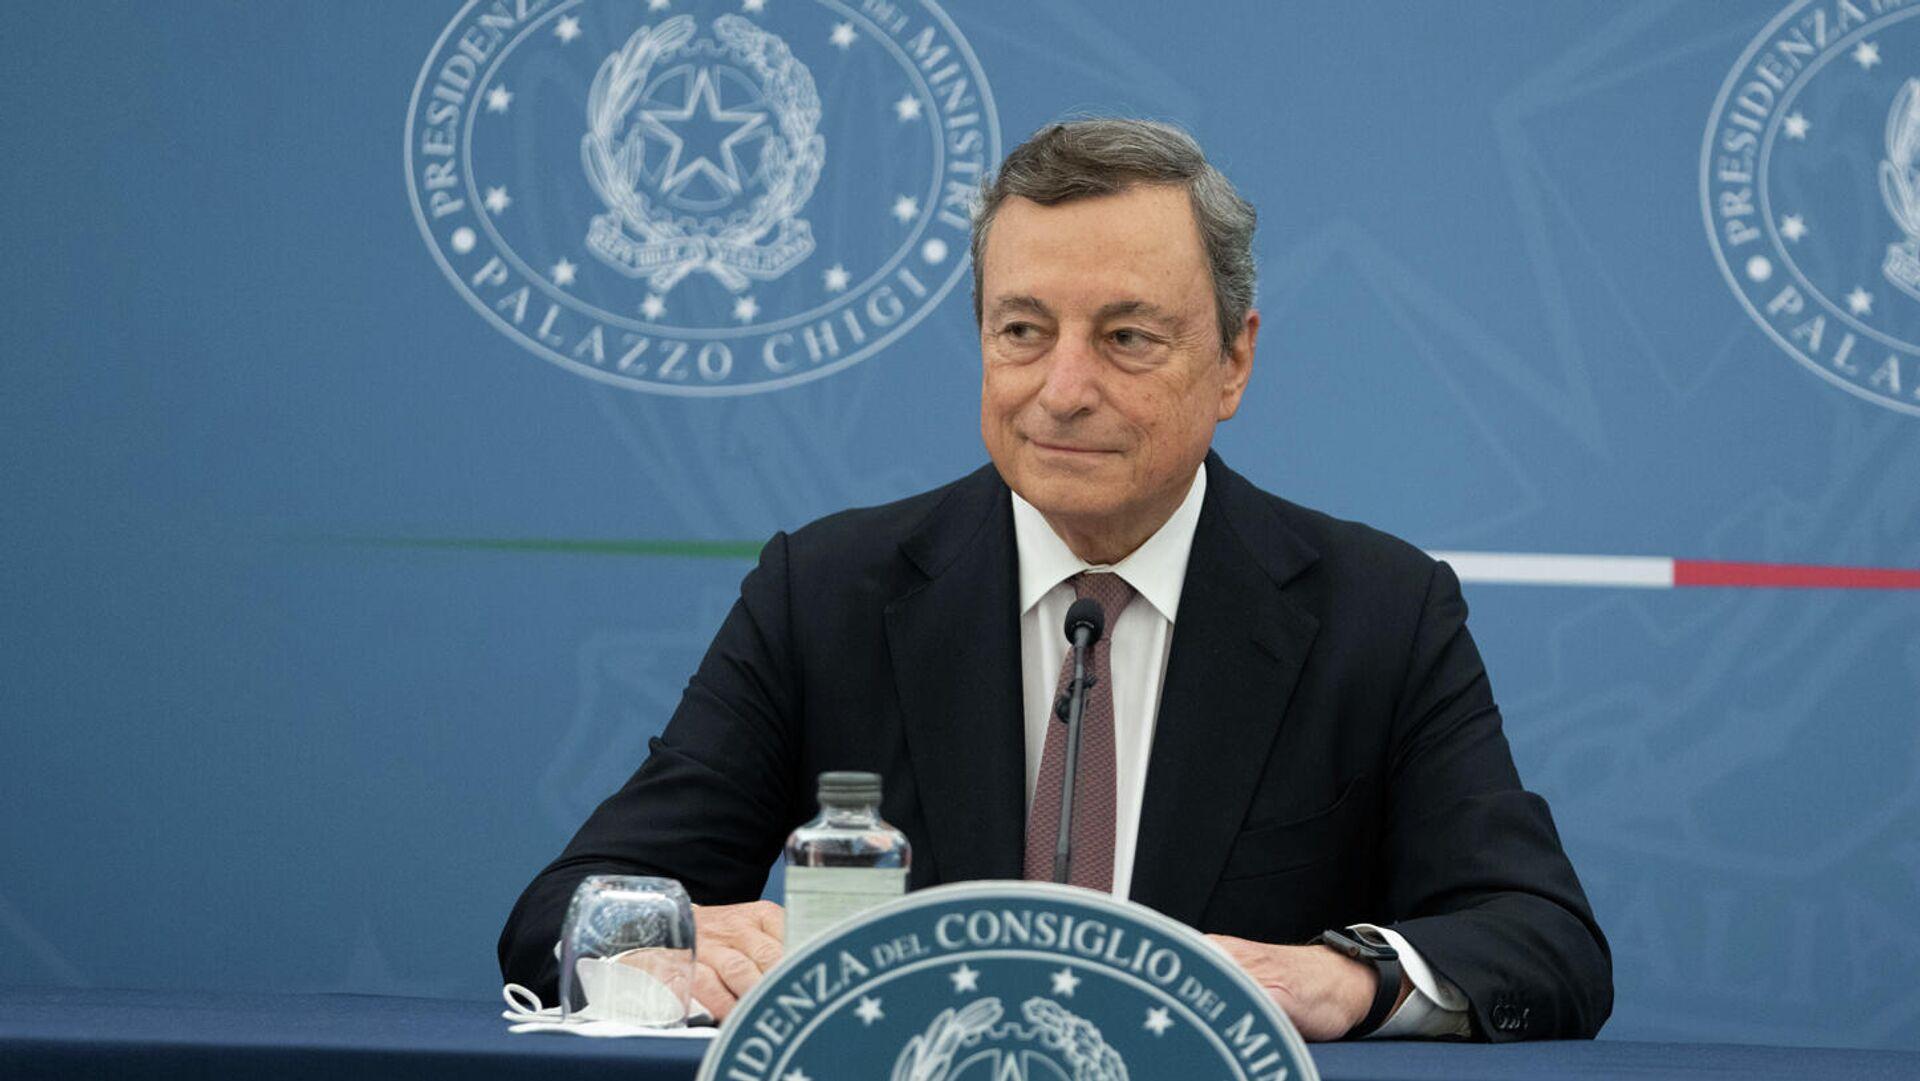 Conferenza stampa del Presidente Draghi  - Sputnik Italia, 1920, 15.09.2021